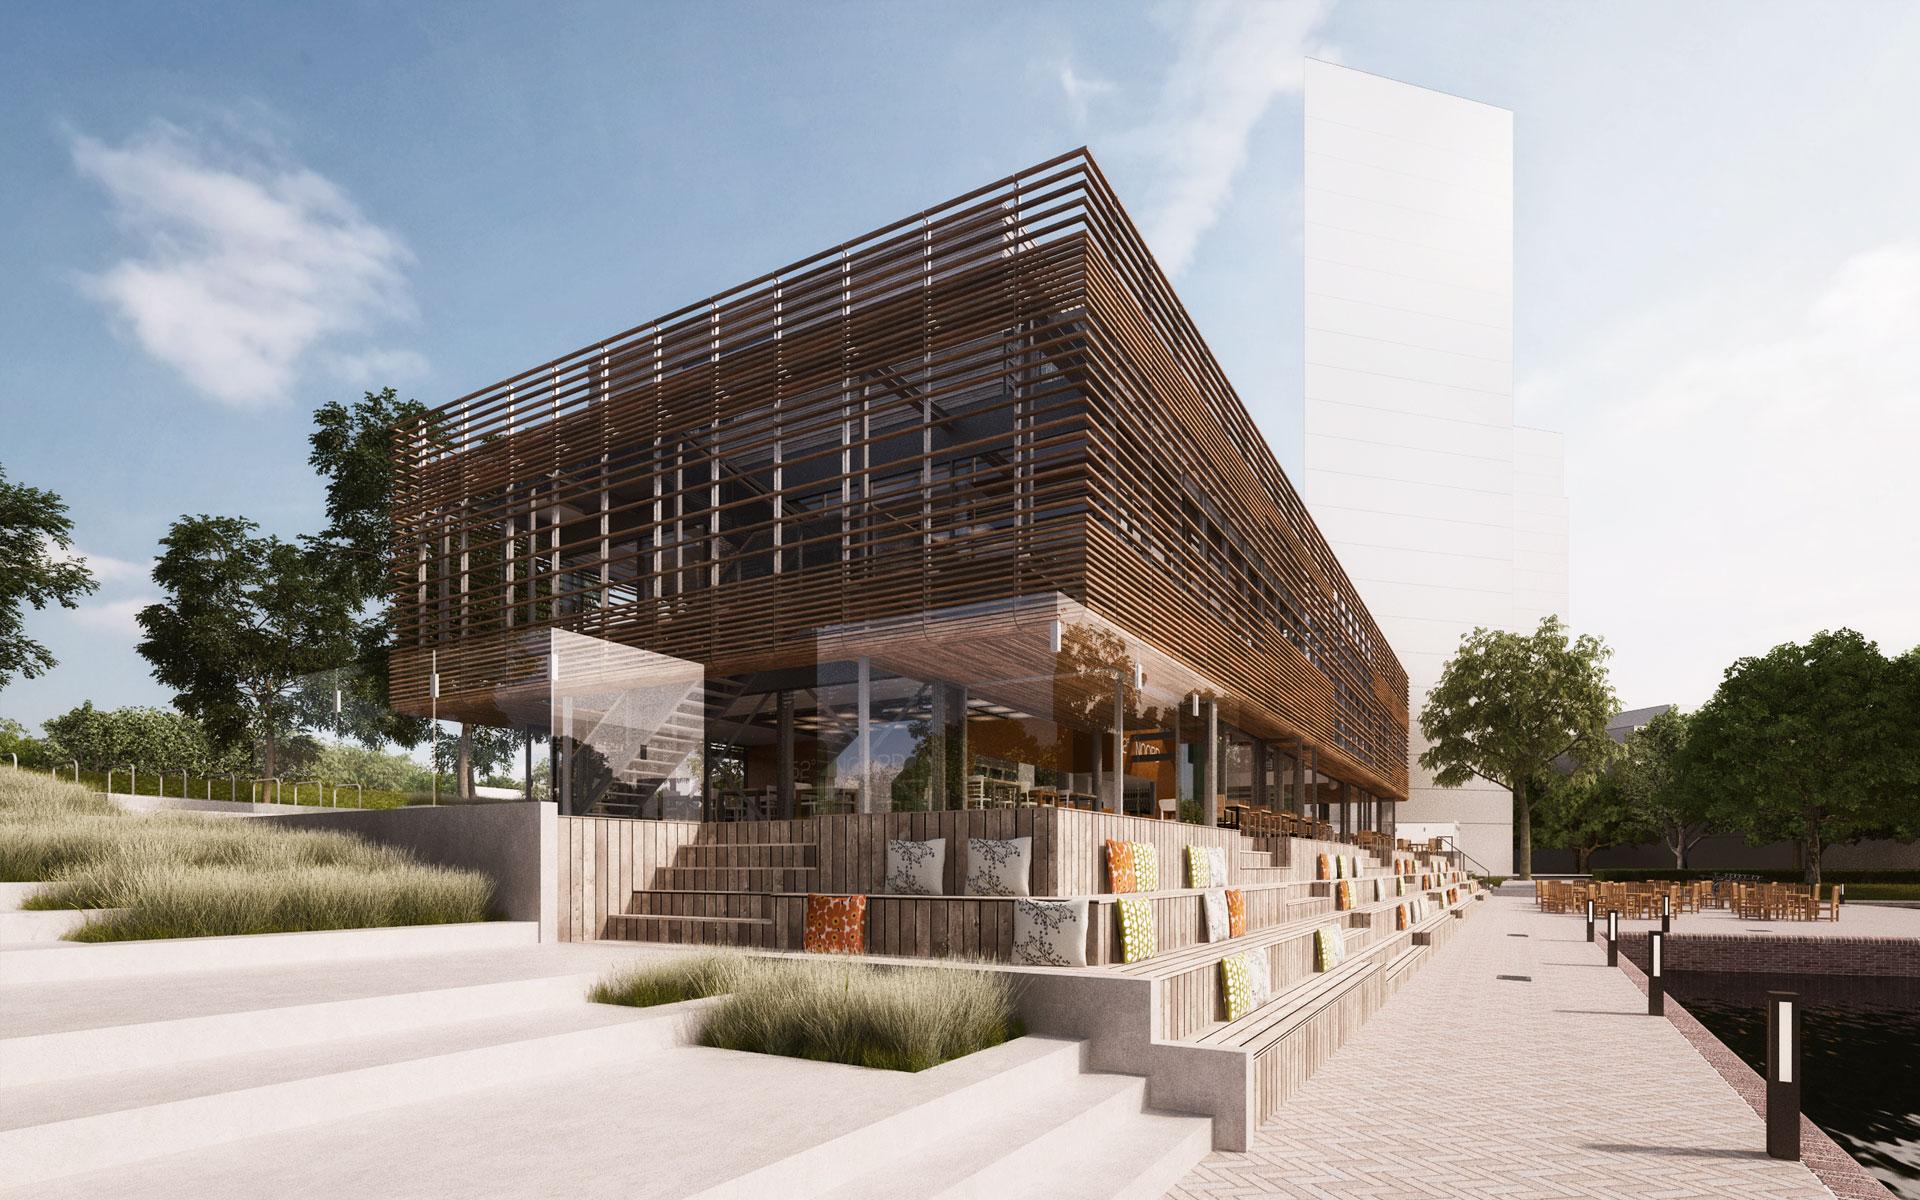 Stadshavengebouw Amstelkwartier Amsterdam - BINT architecten